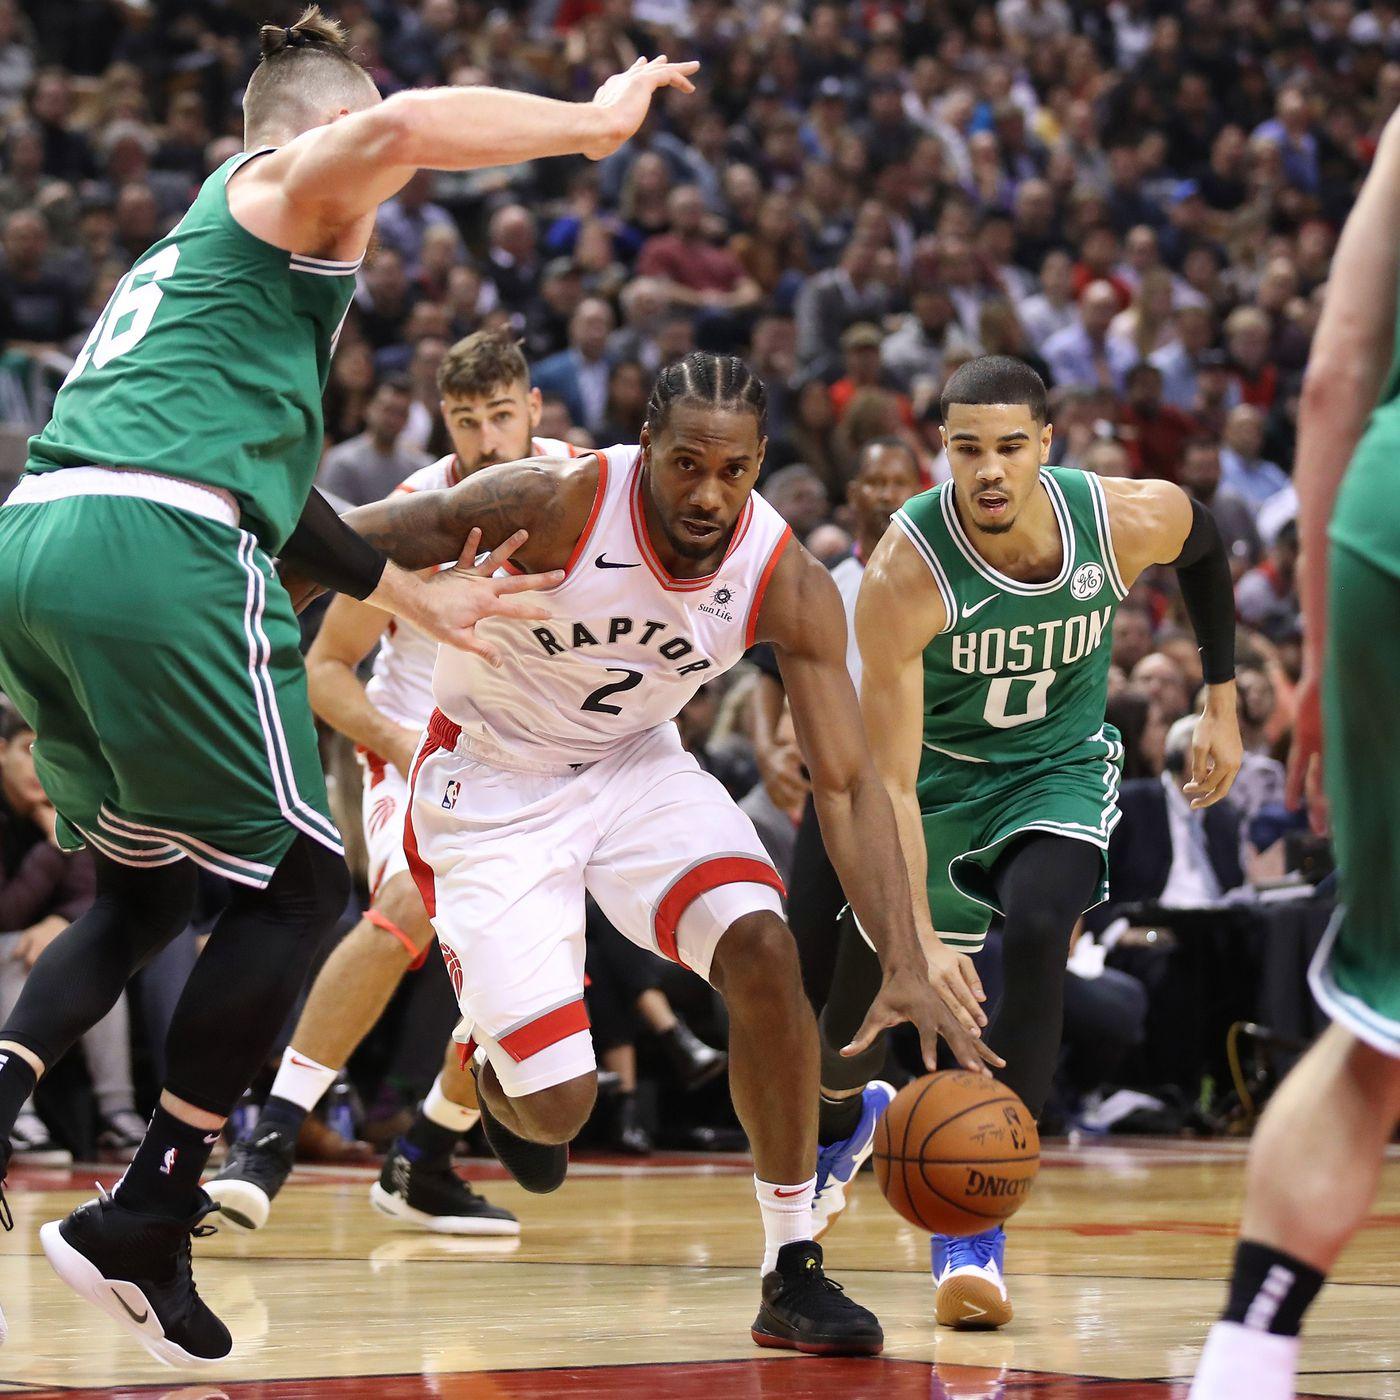 Nhận định NBA: Toronto Raptors vs Boston Celtics (ngày 27/2, 8h00)